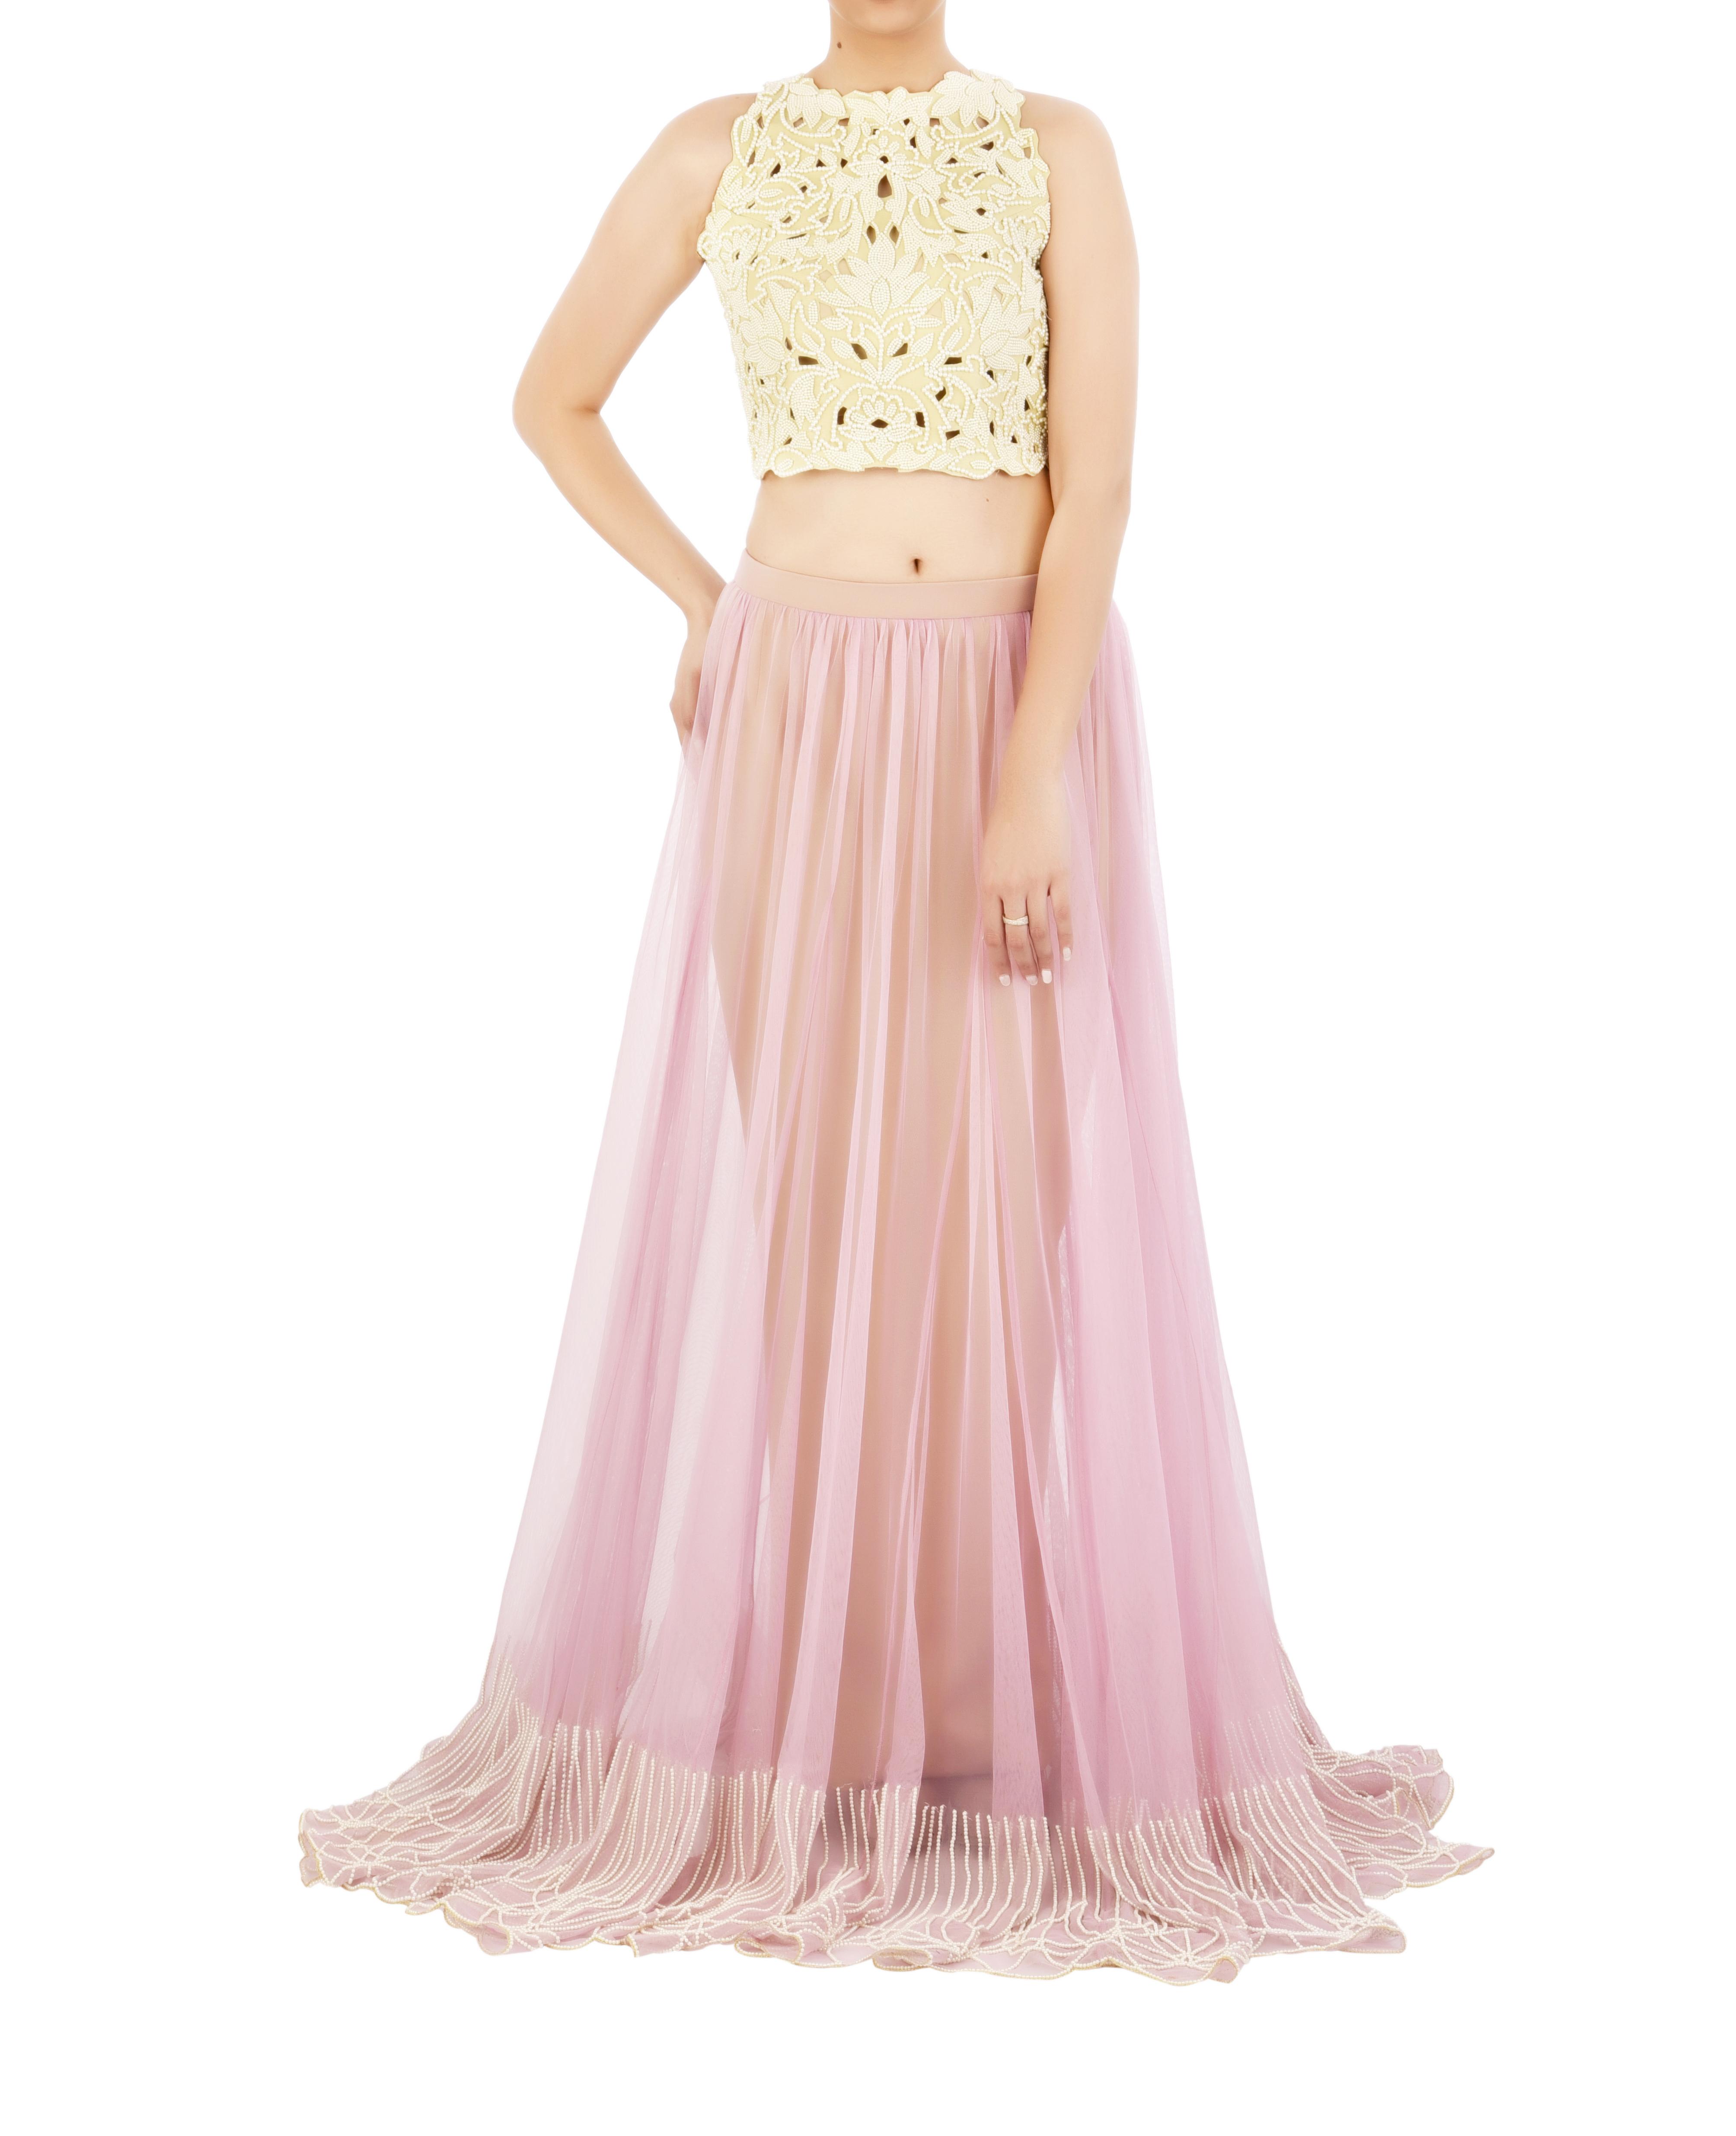 Lilac lehenga skirt with pearl embroidered border